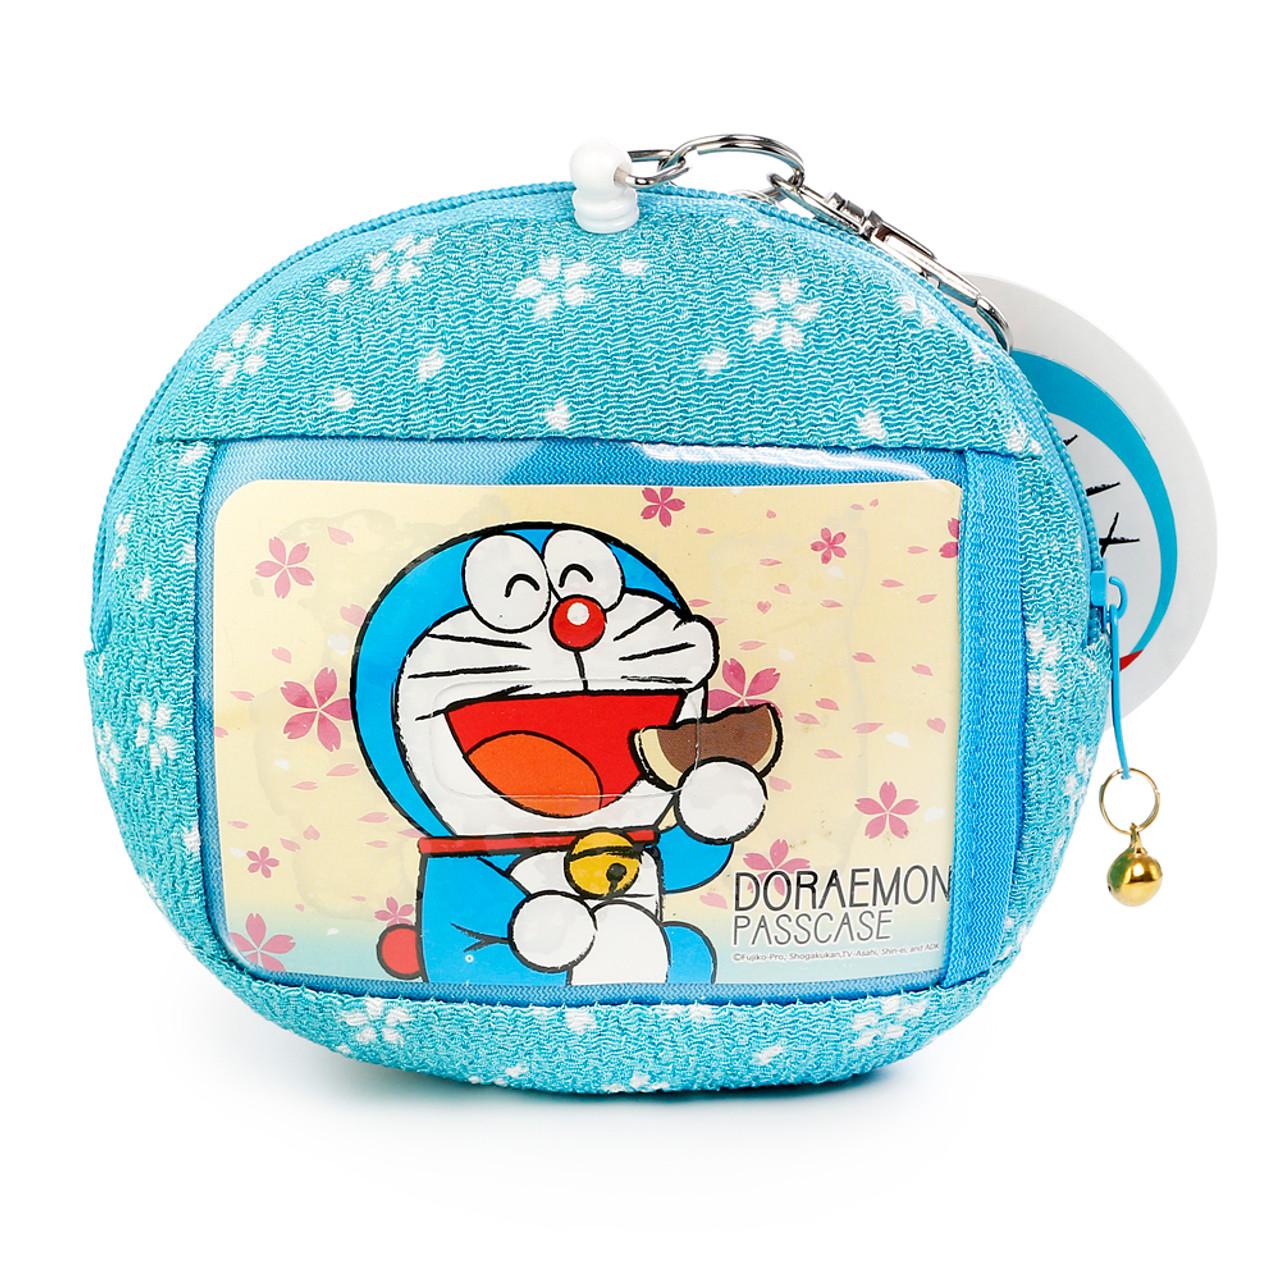 Doraemon Magic Stuffs Pocket Design Smart Card And Coins Wallet ( Back View )